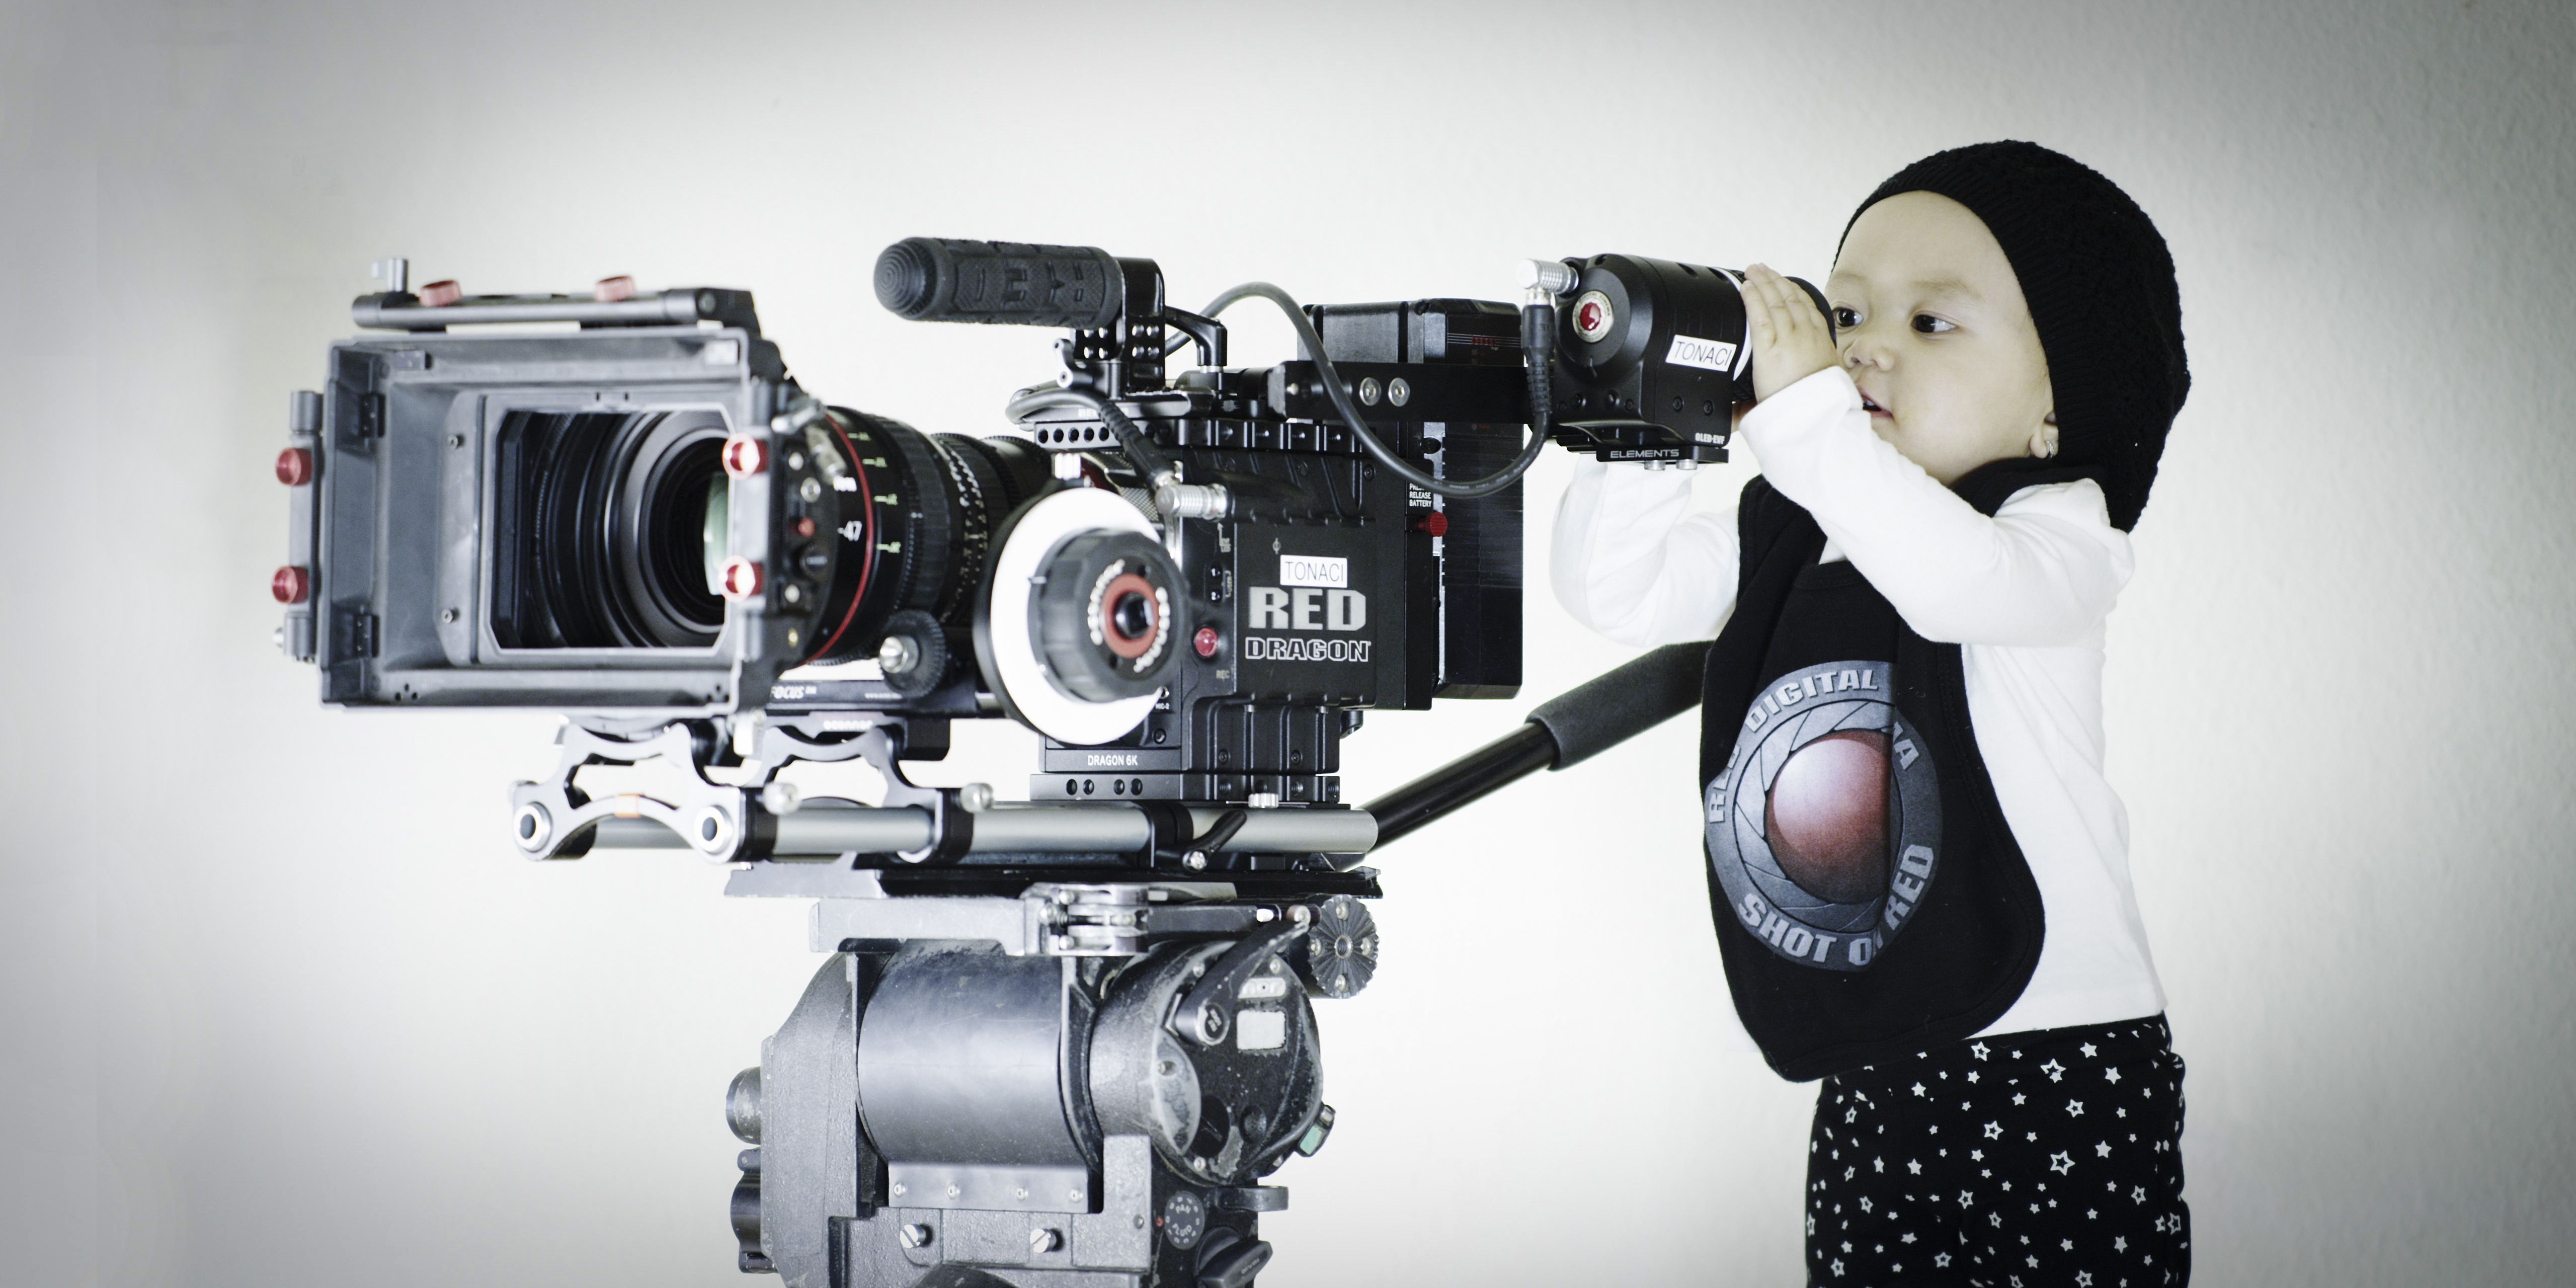 red-epic-dragon-rental | Cinema Cameras | Pinterest | Cinema ...